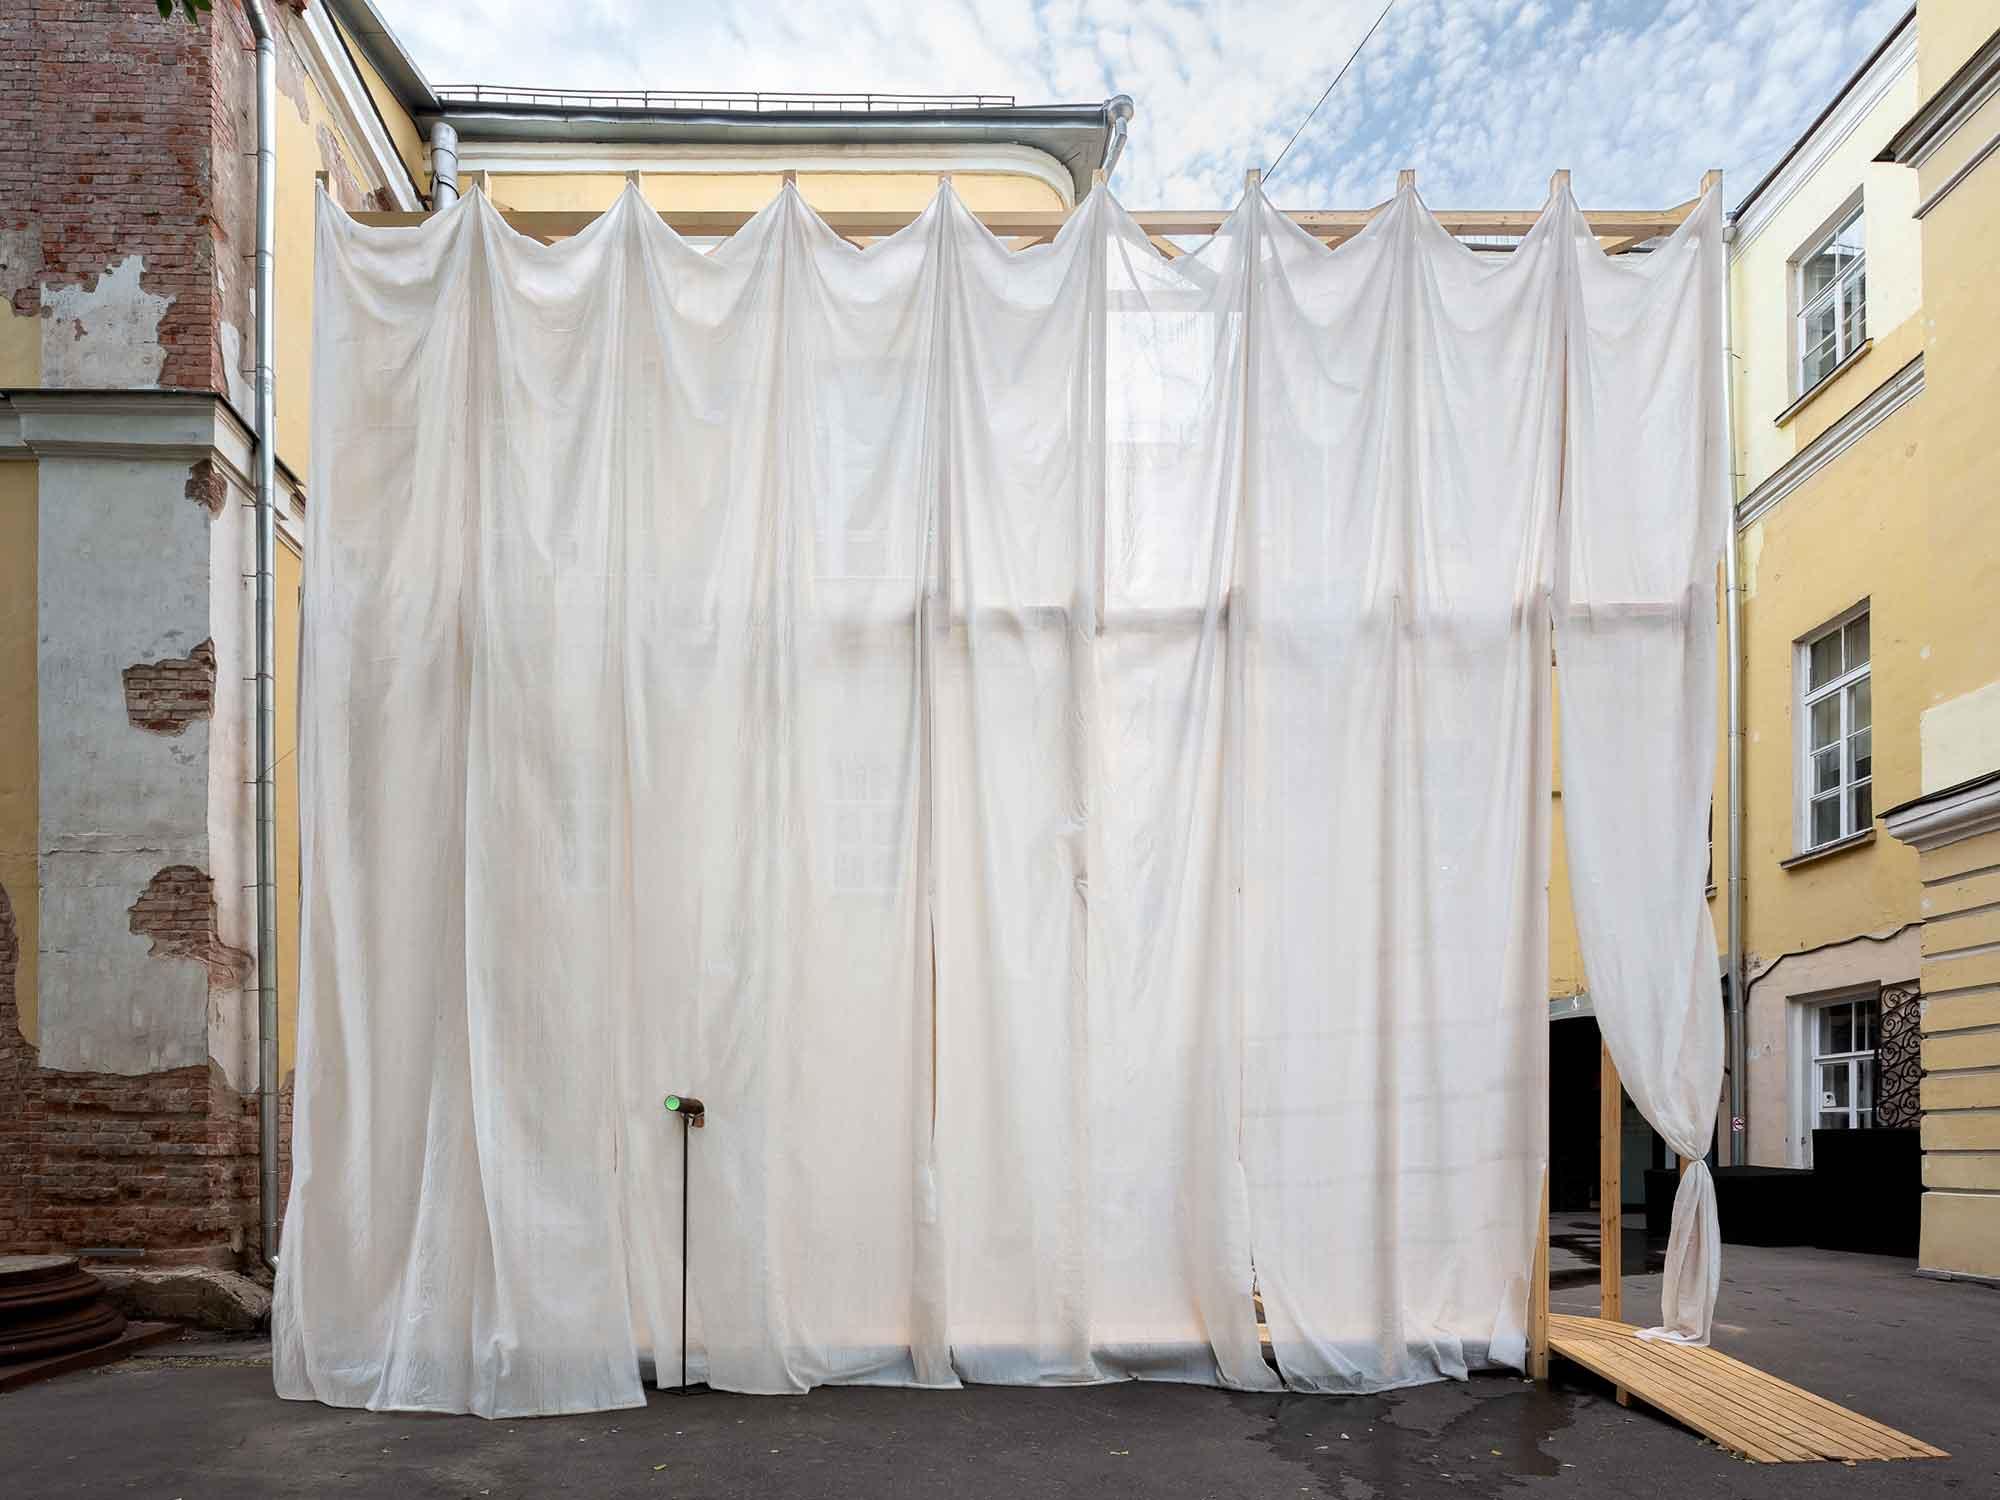 Maria Kremer, Curtain (False Façade) (2018). Construction from wooden beams and façade netting.